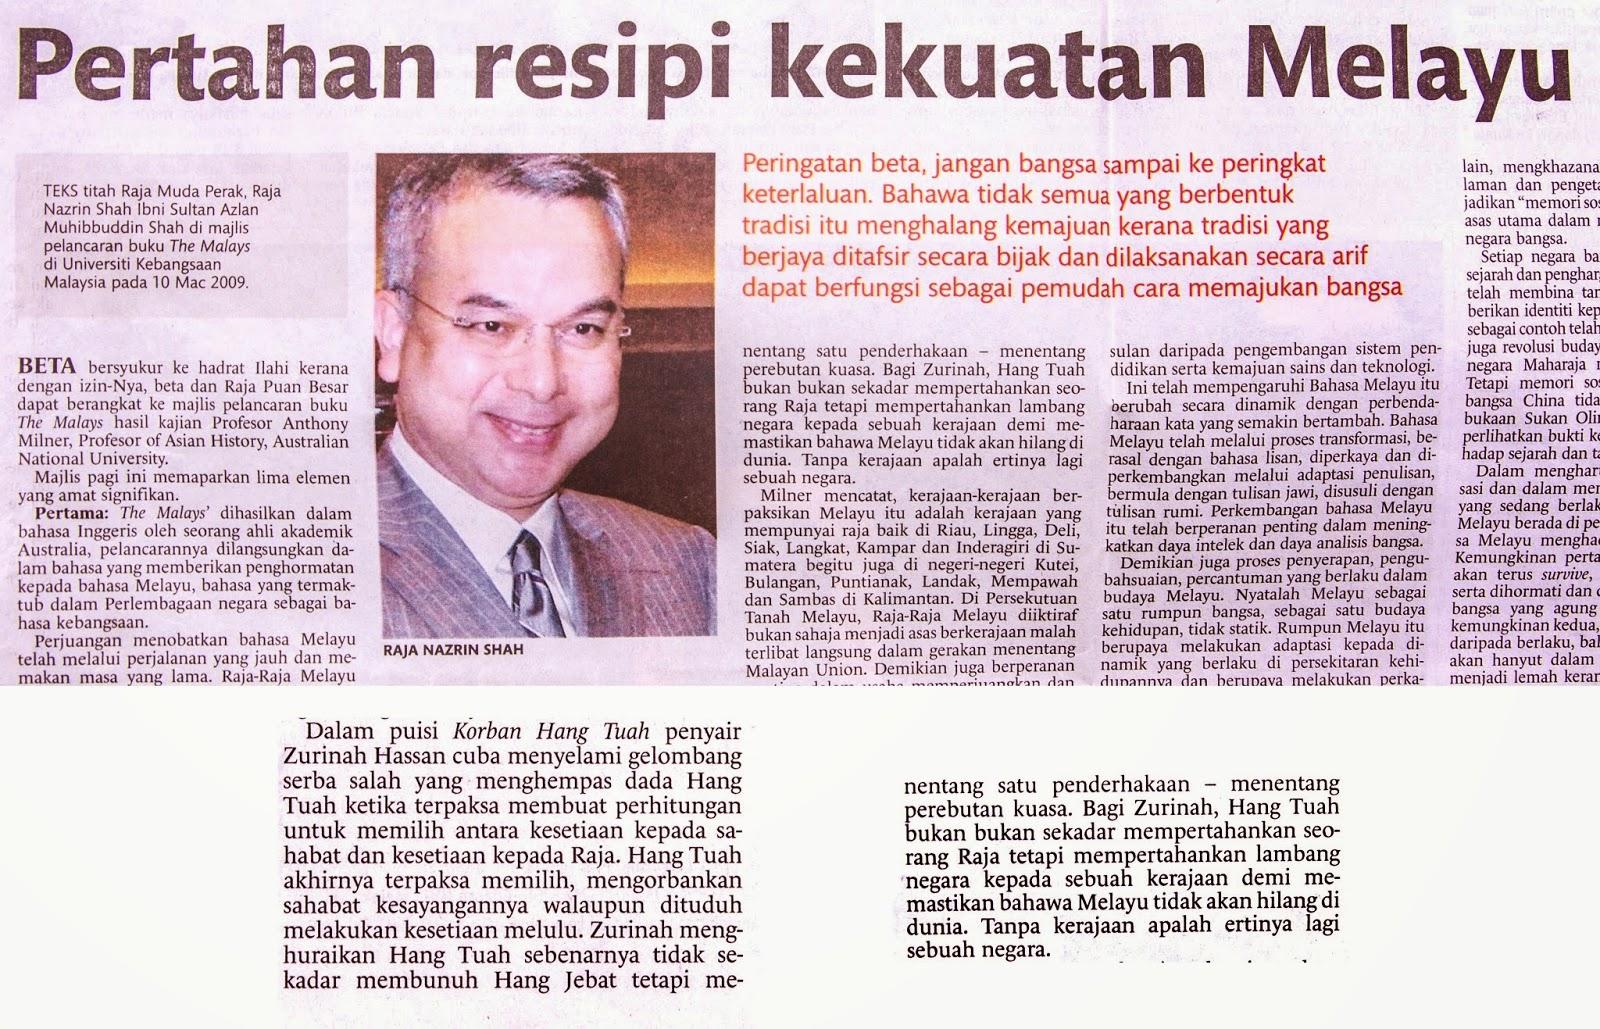 Artikel Sultan Perak